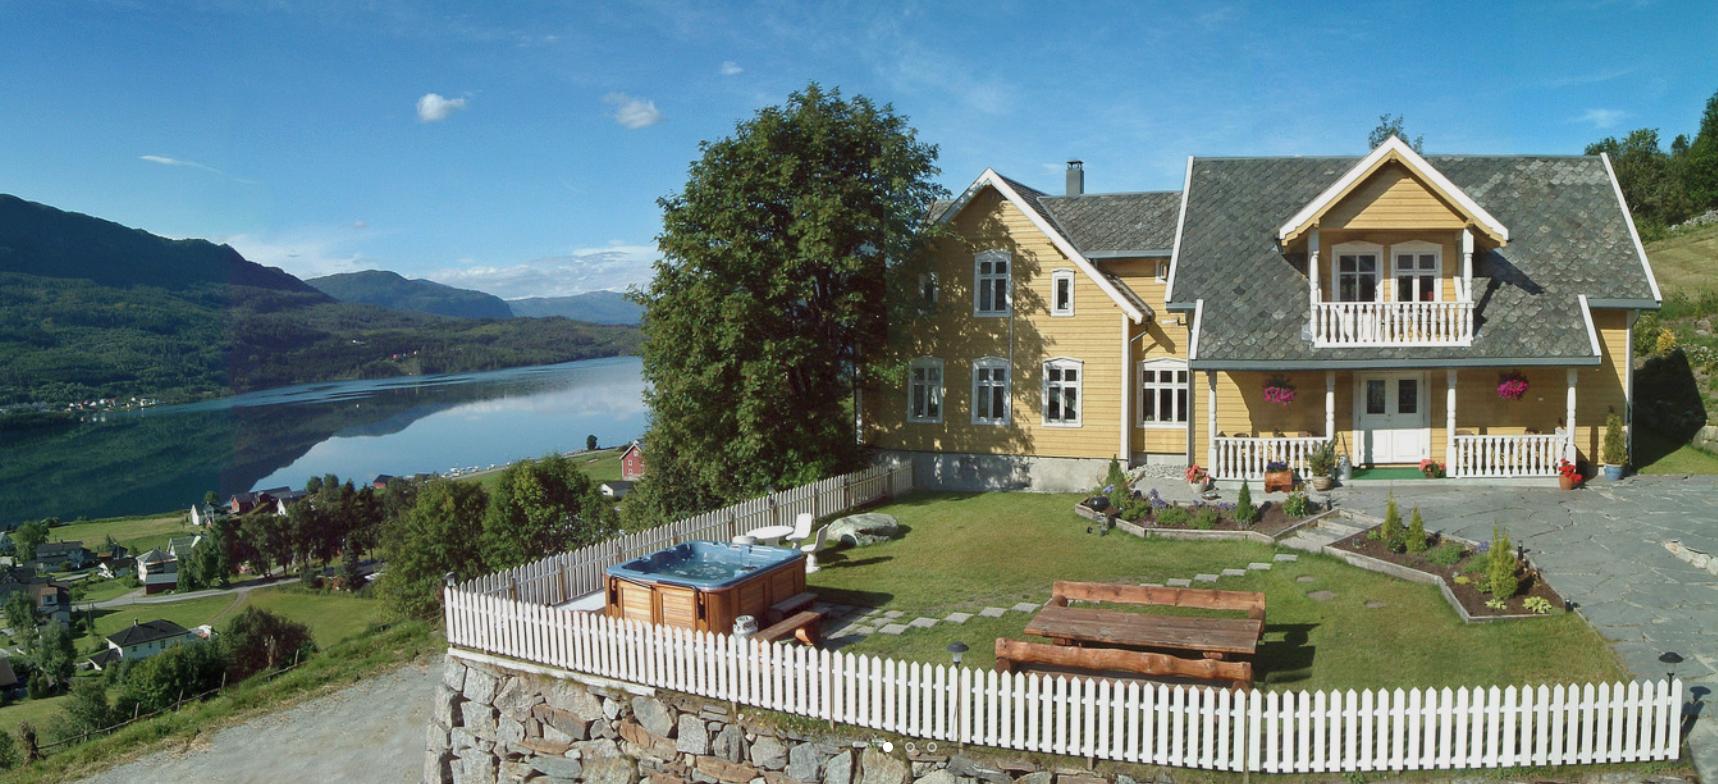 Bestebakken, overlooking the lake and village of Hafslo